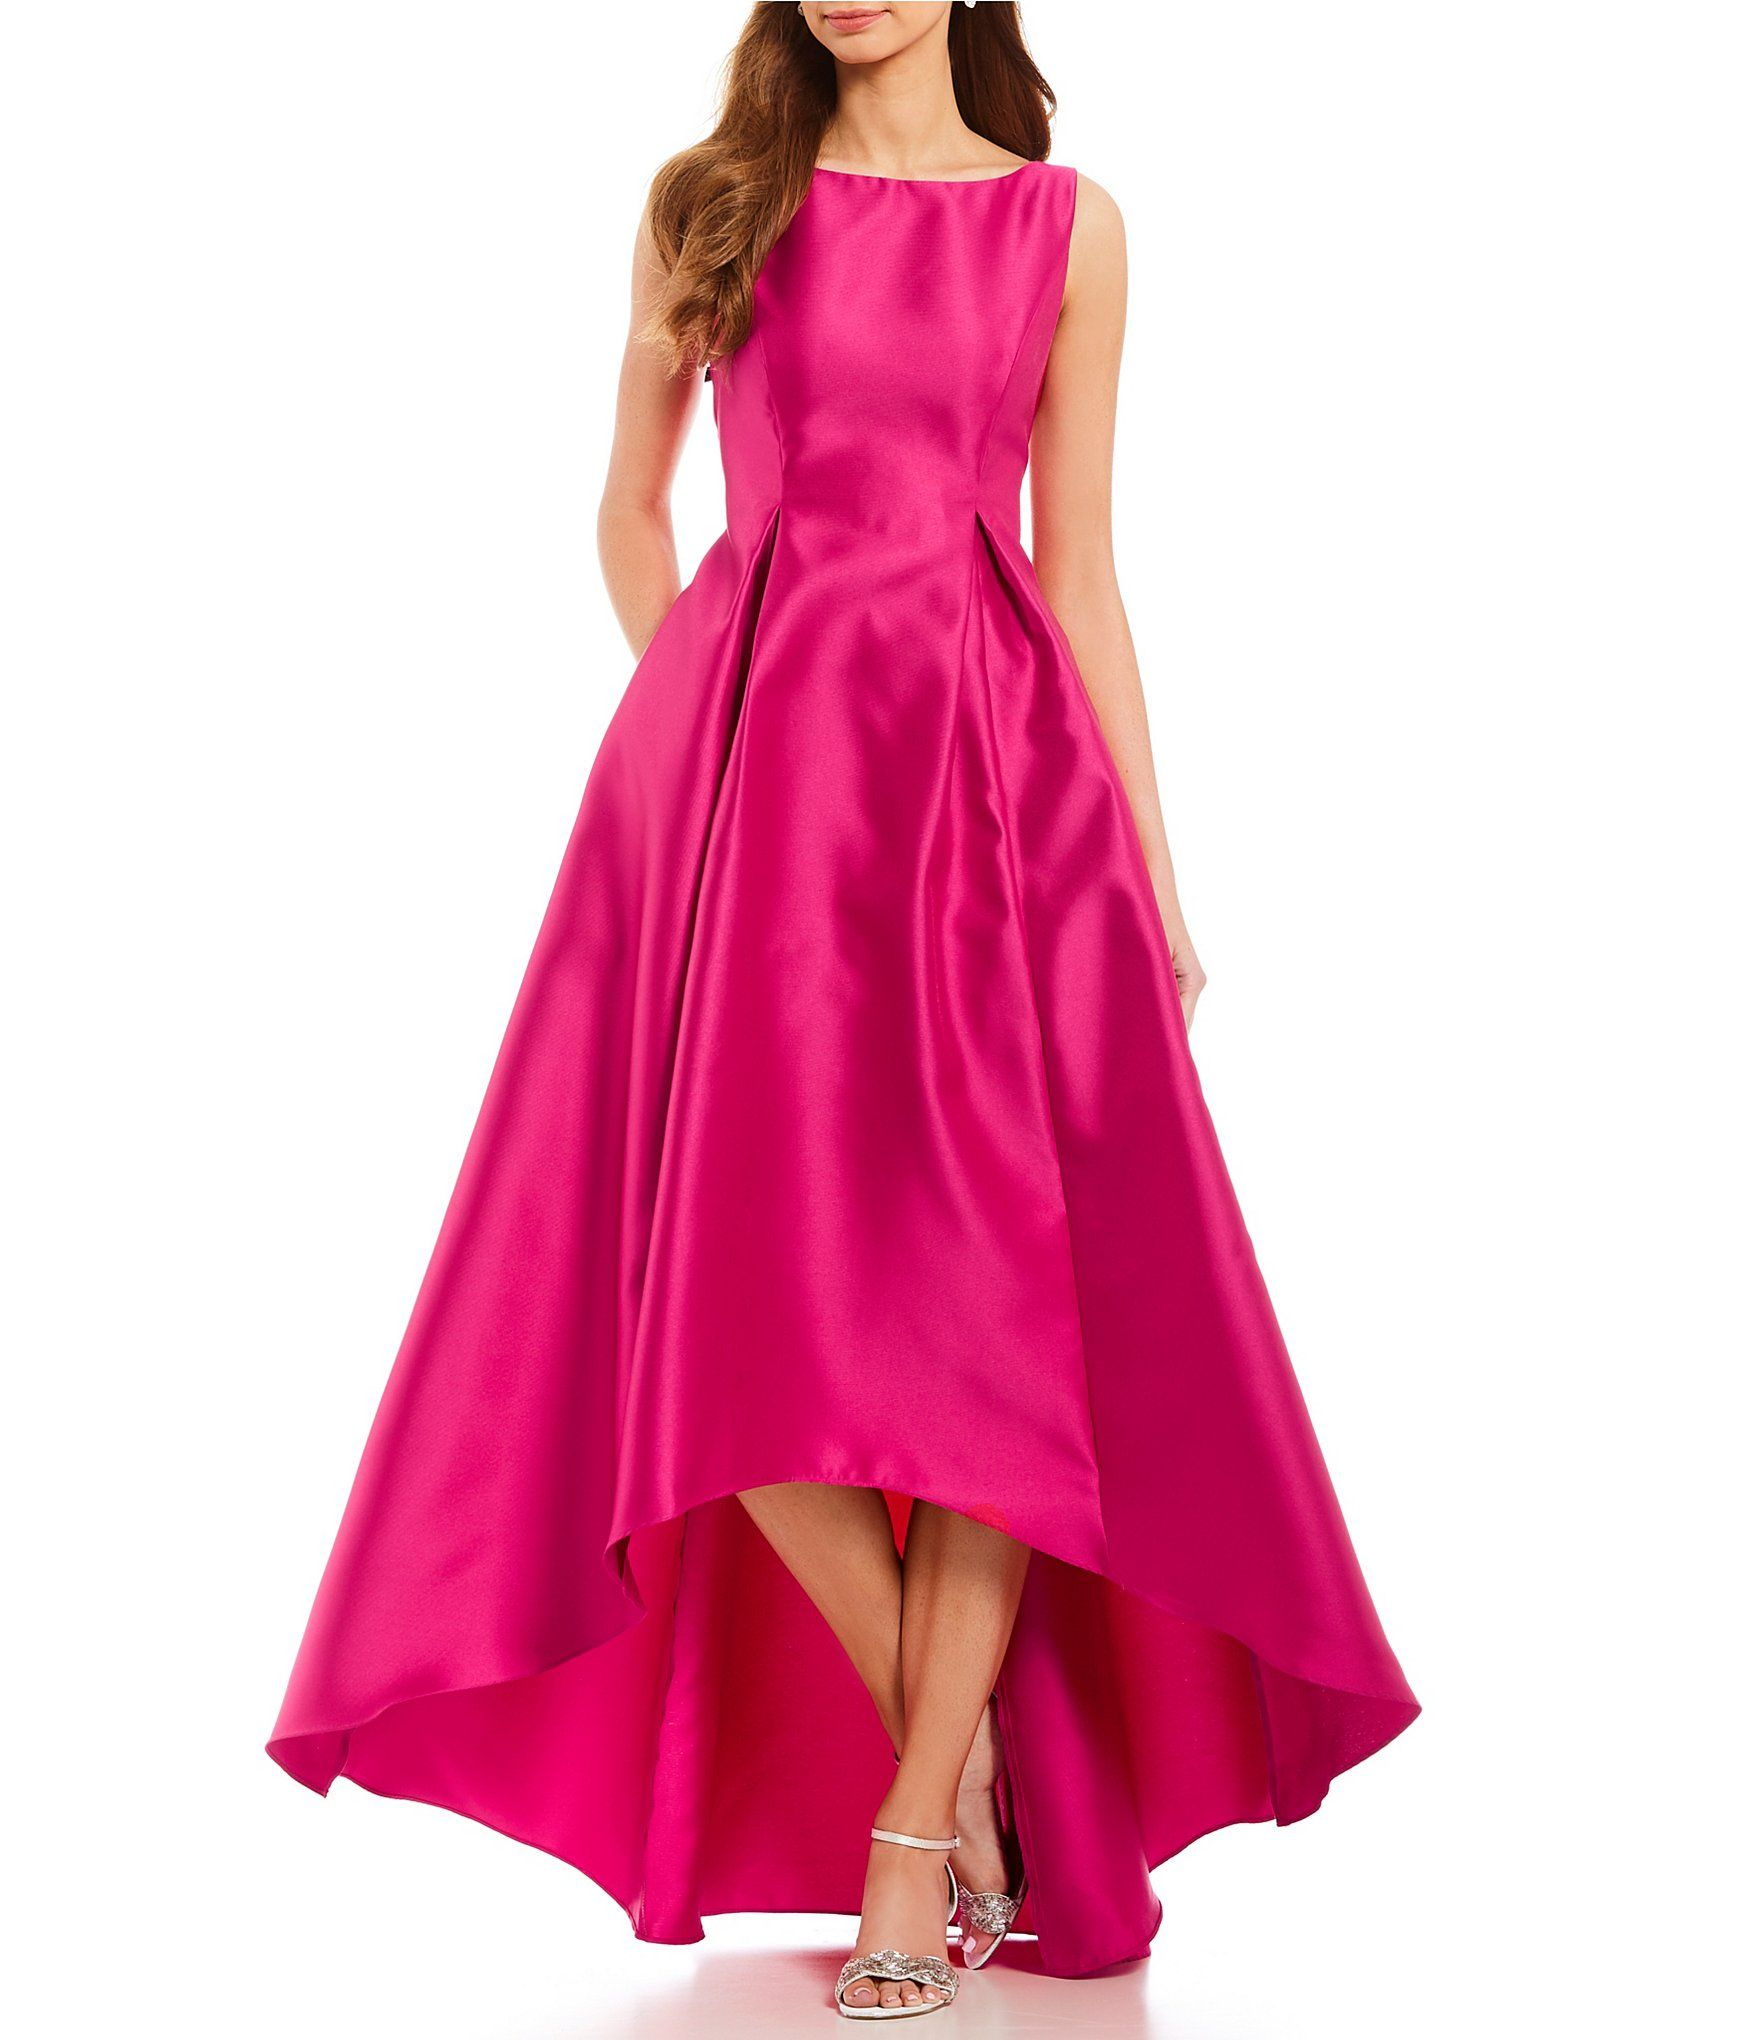 Adrianna Papell Hi-Low Sleeveless Taffeta Gown | Pinterest | Alegria ...